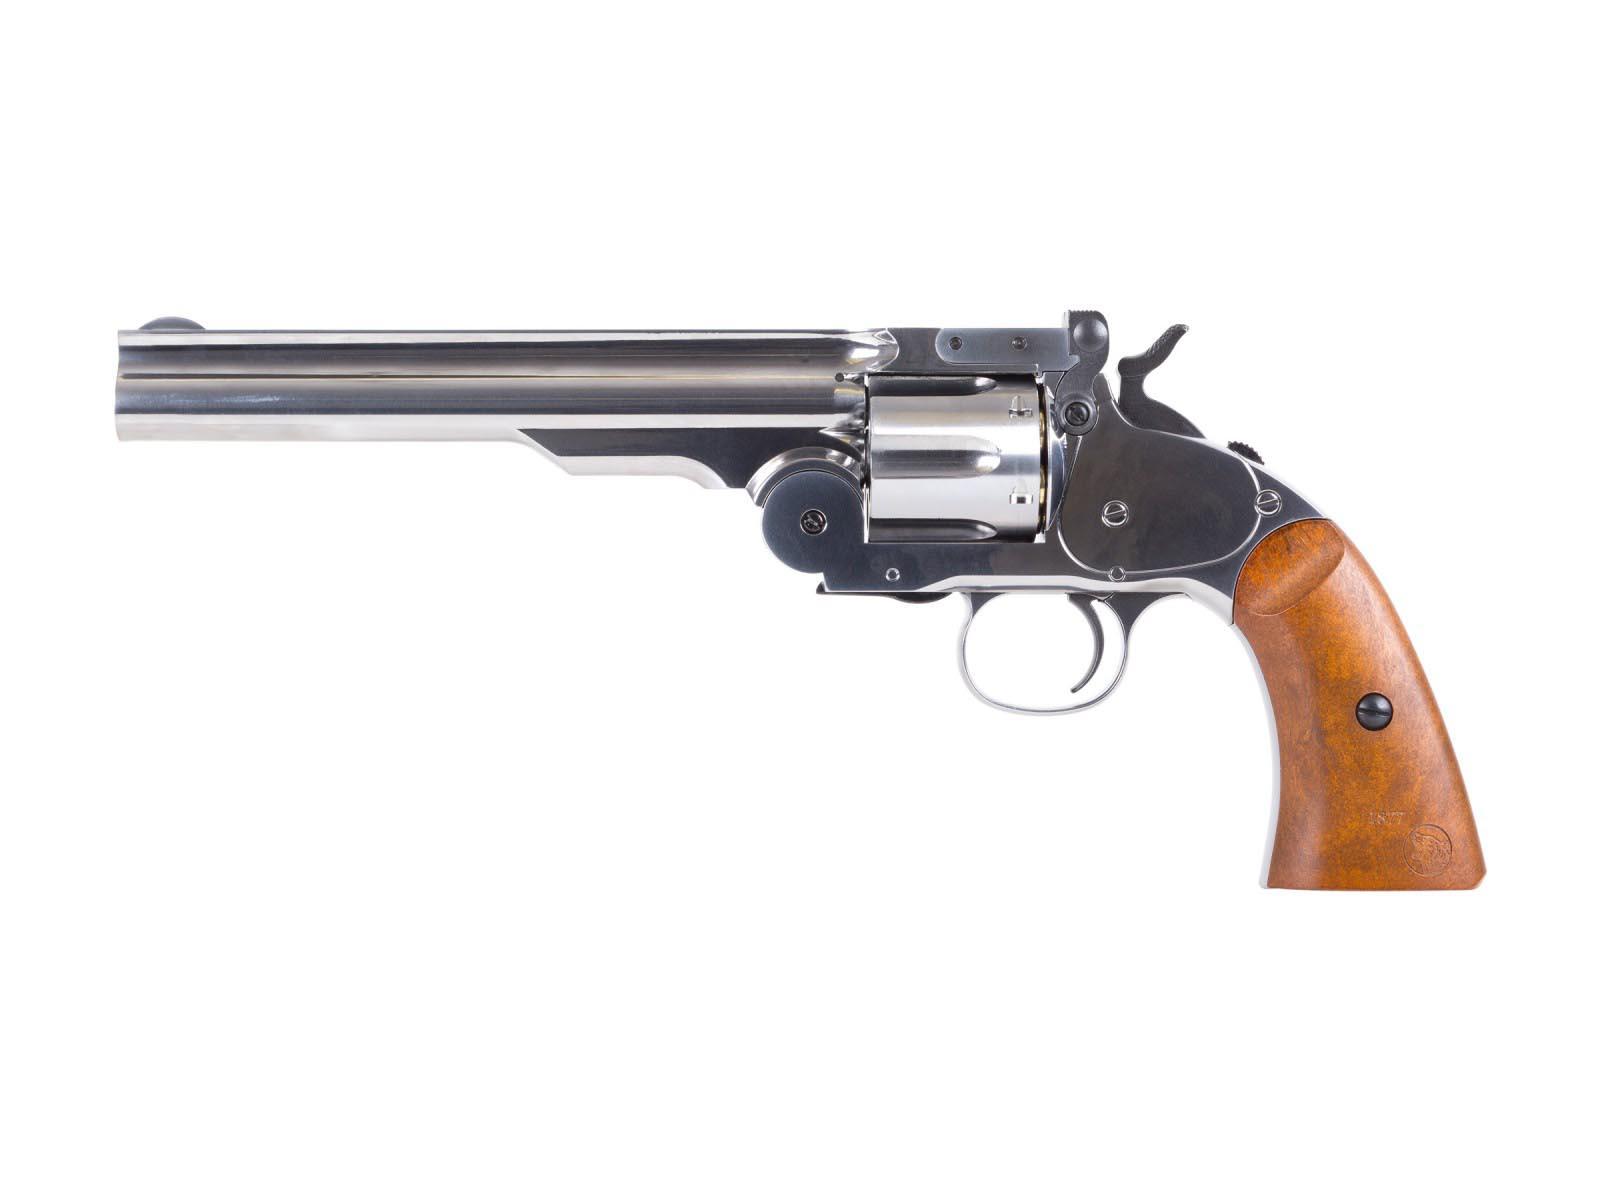 Schofield No. 3 BB Revolver, Nickel